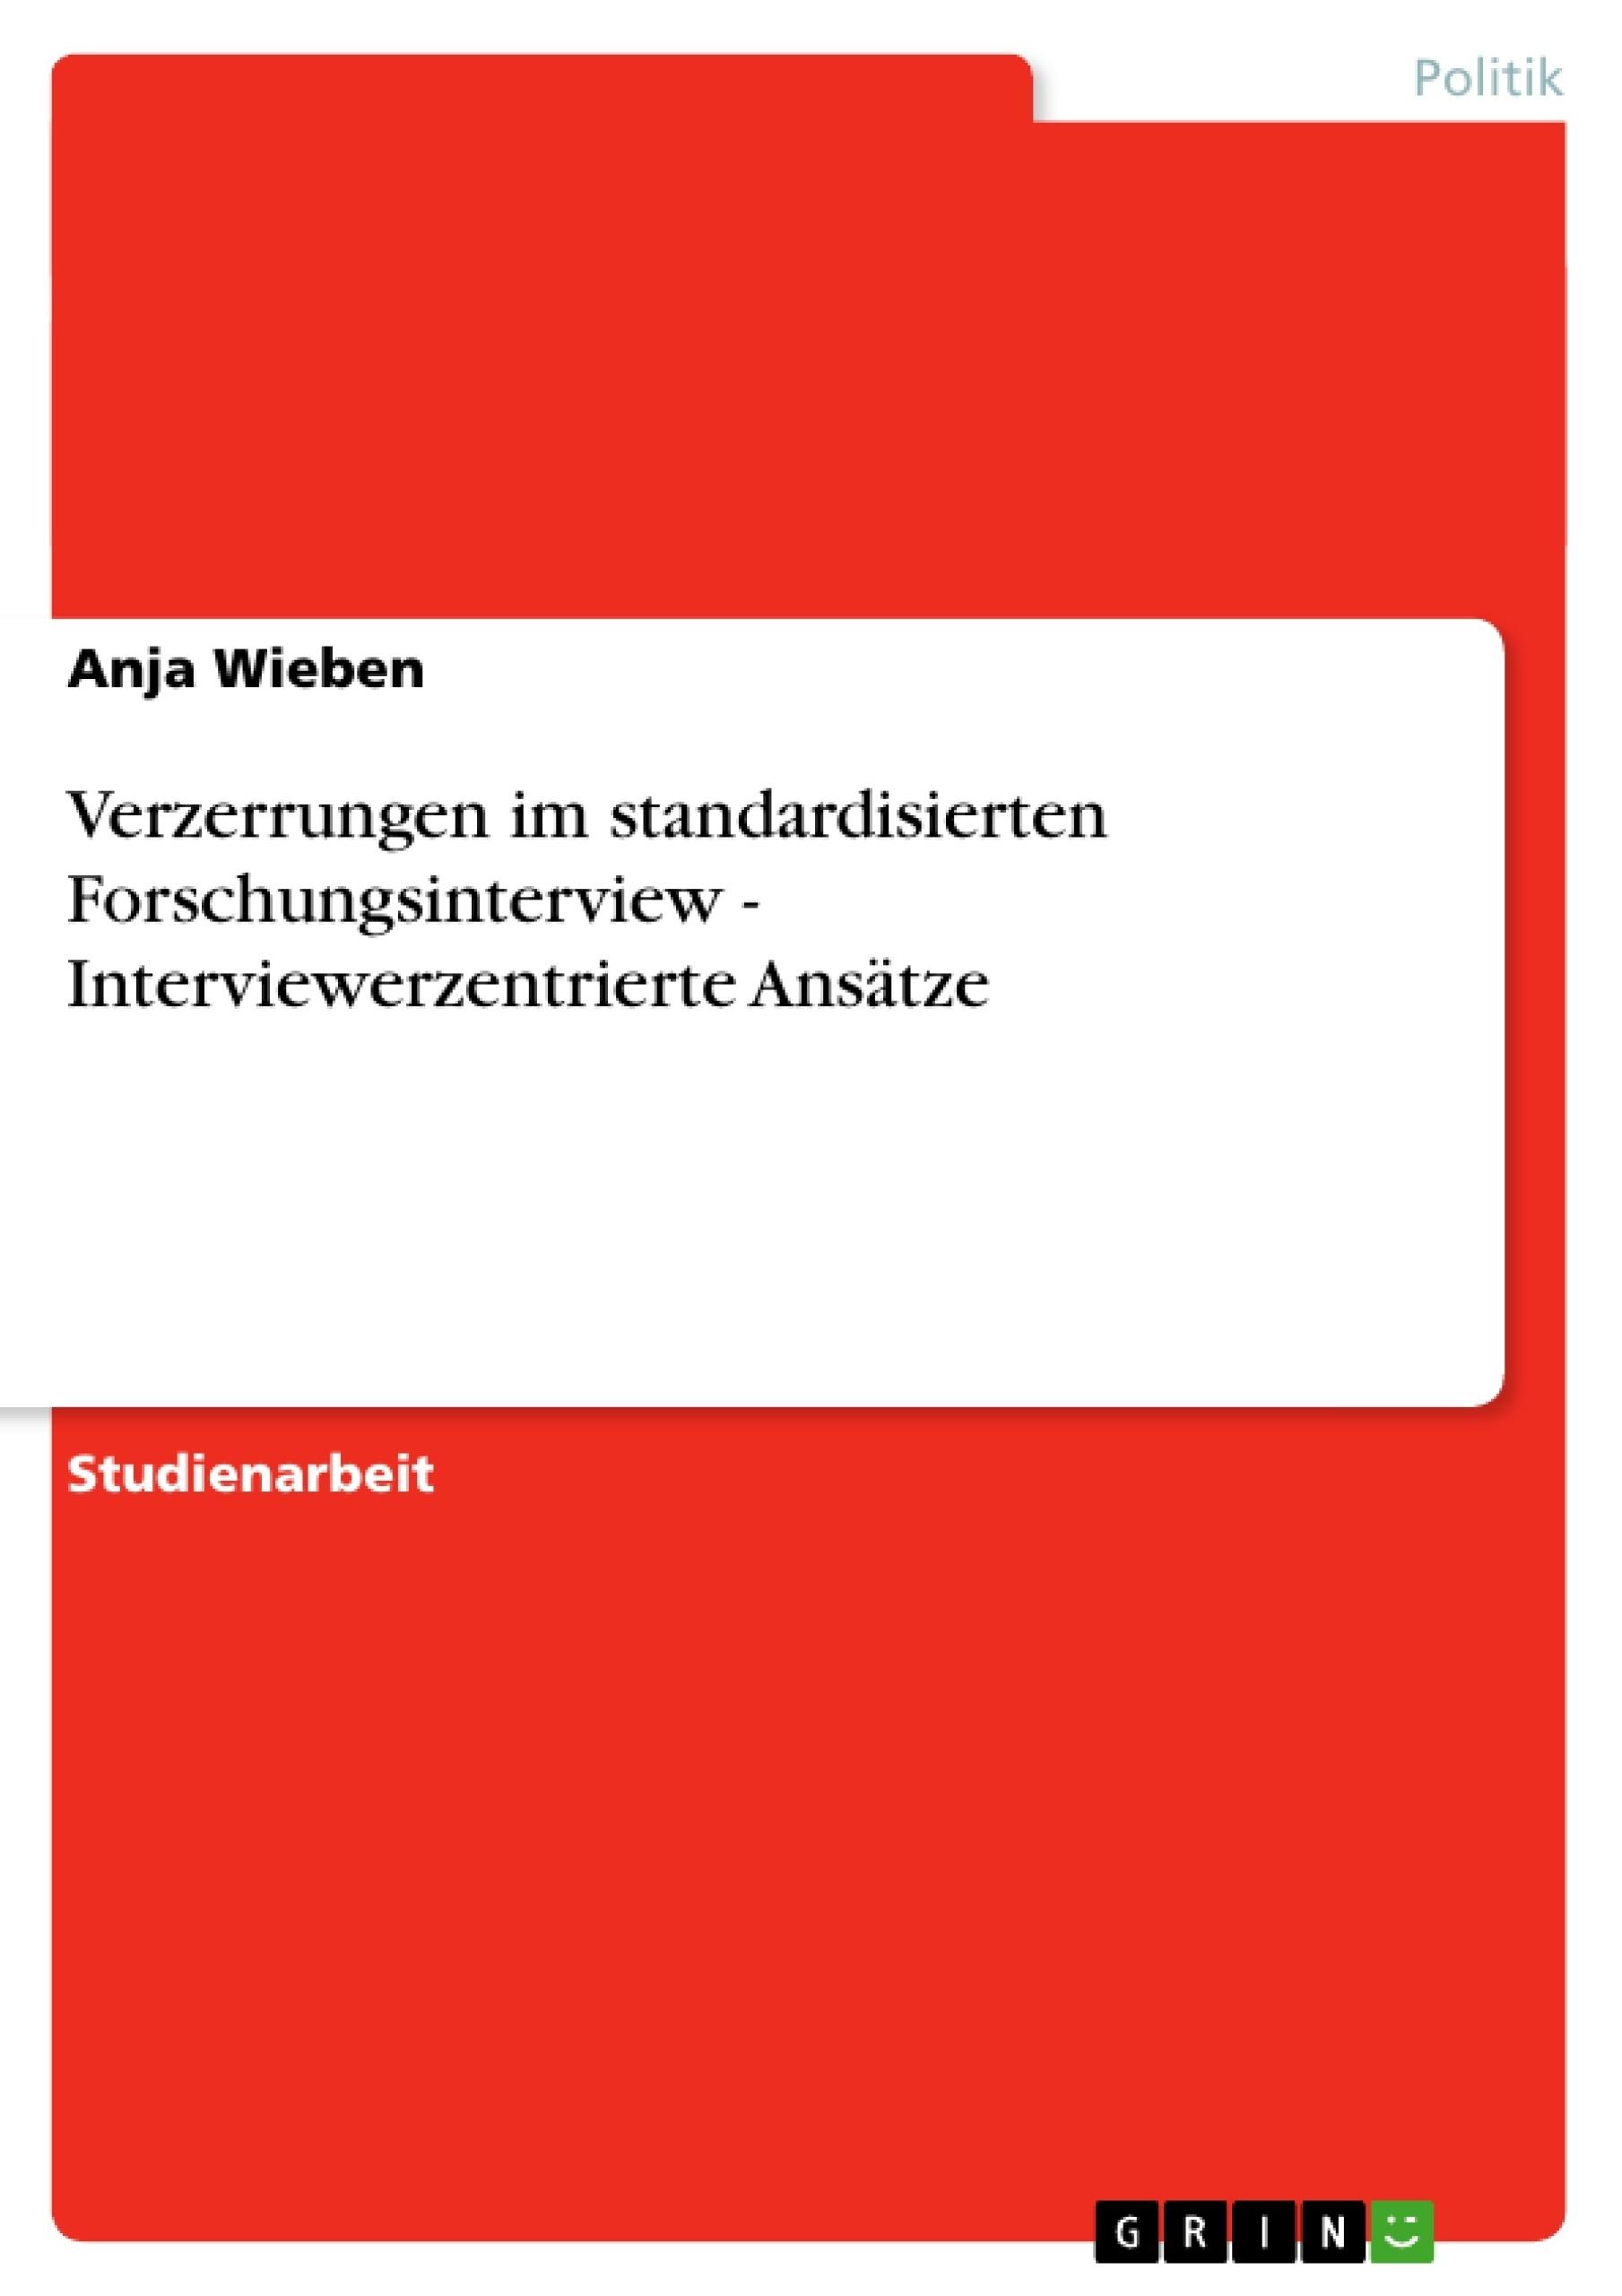 Titel: Verzerrungen im standardisierten Forschungsinterview - Interviewerzentrierte Ansätze